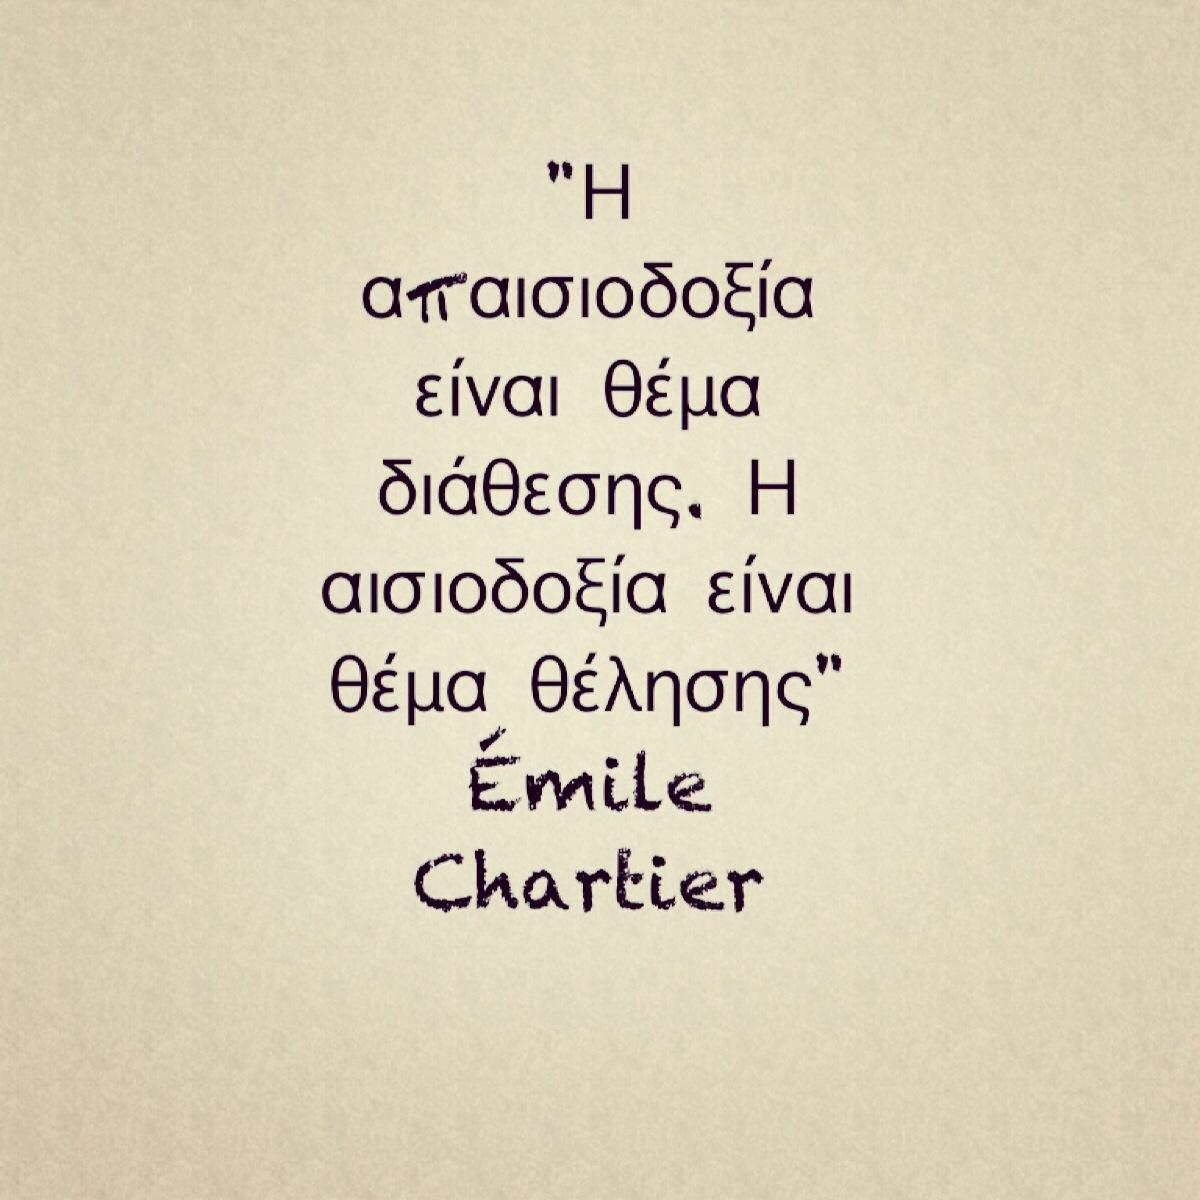 quote-week-aisiodoksia-apaisiodoksia-diathesi-chartier-crystal-diary-ingolden.gr